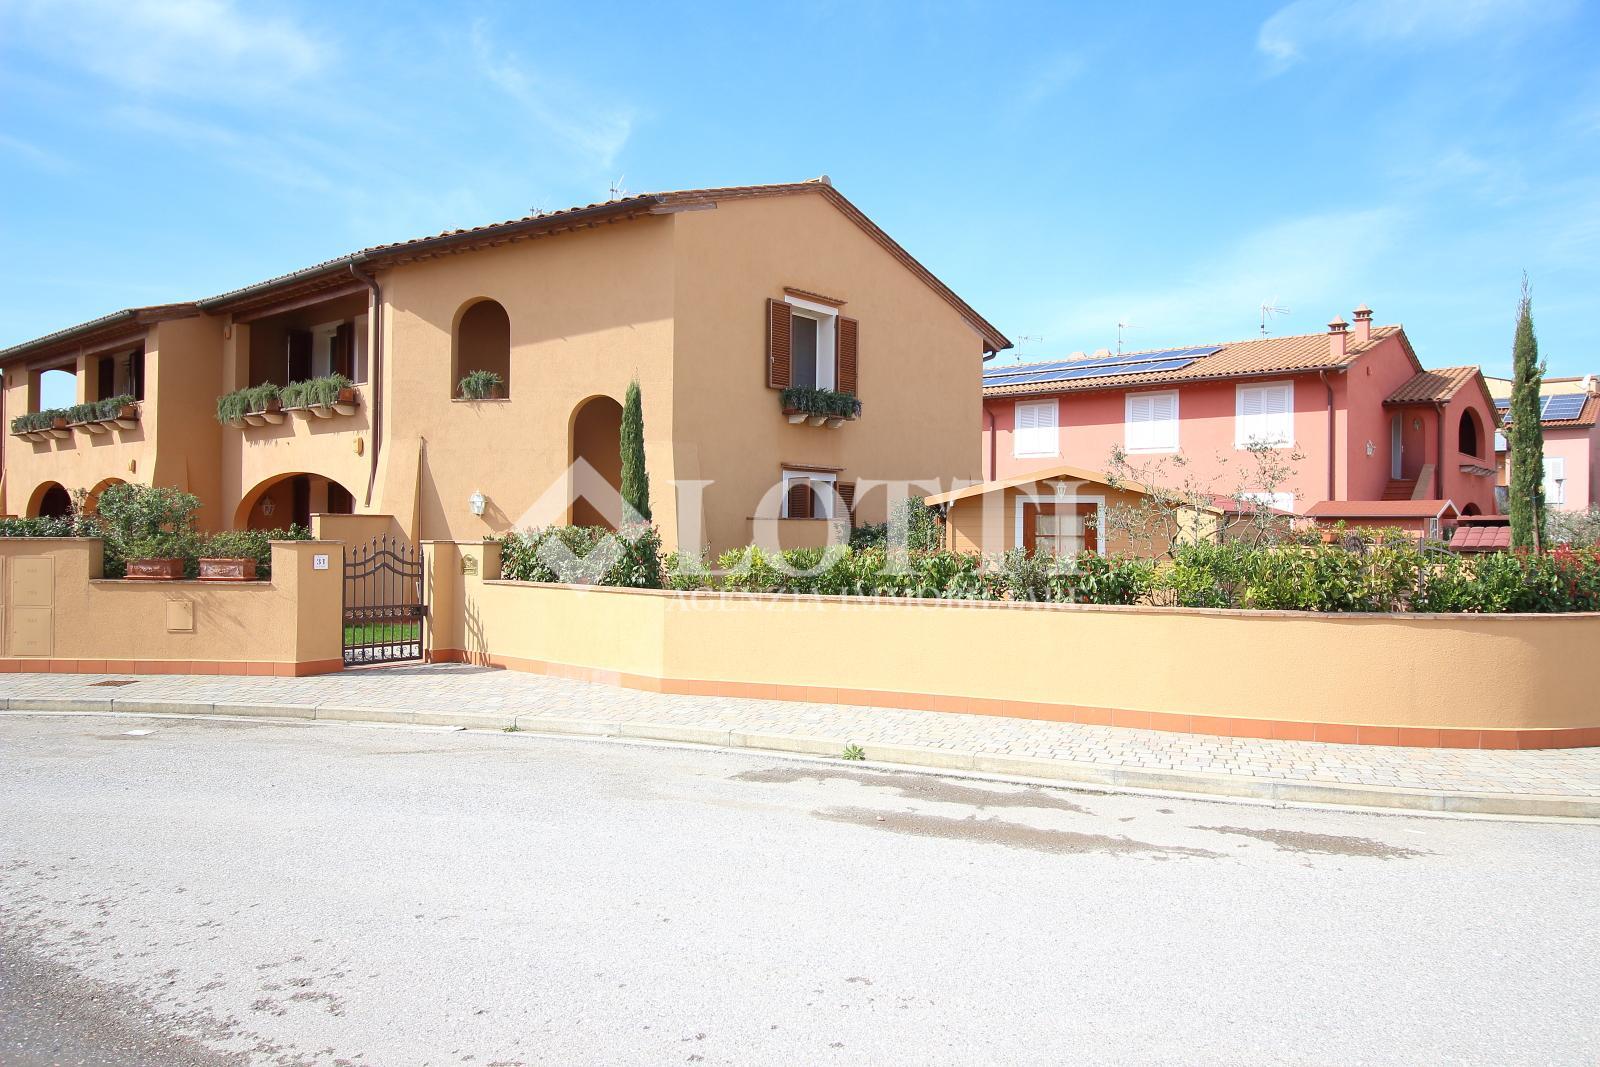 Apartment for sale in Calcinaia (PI)